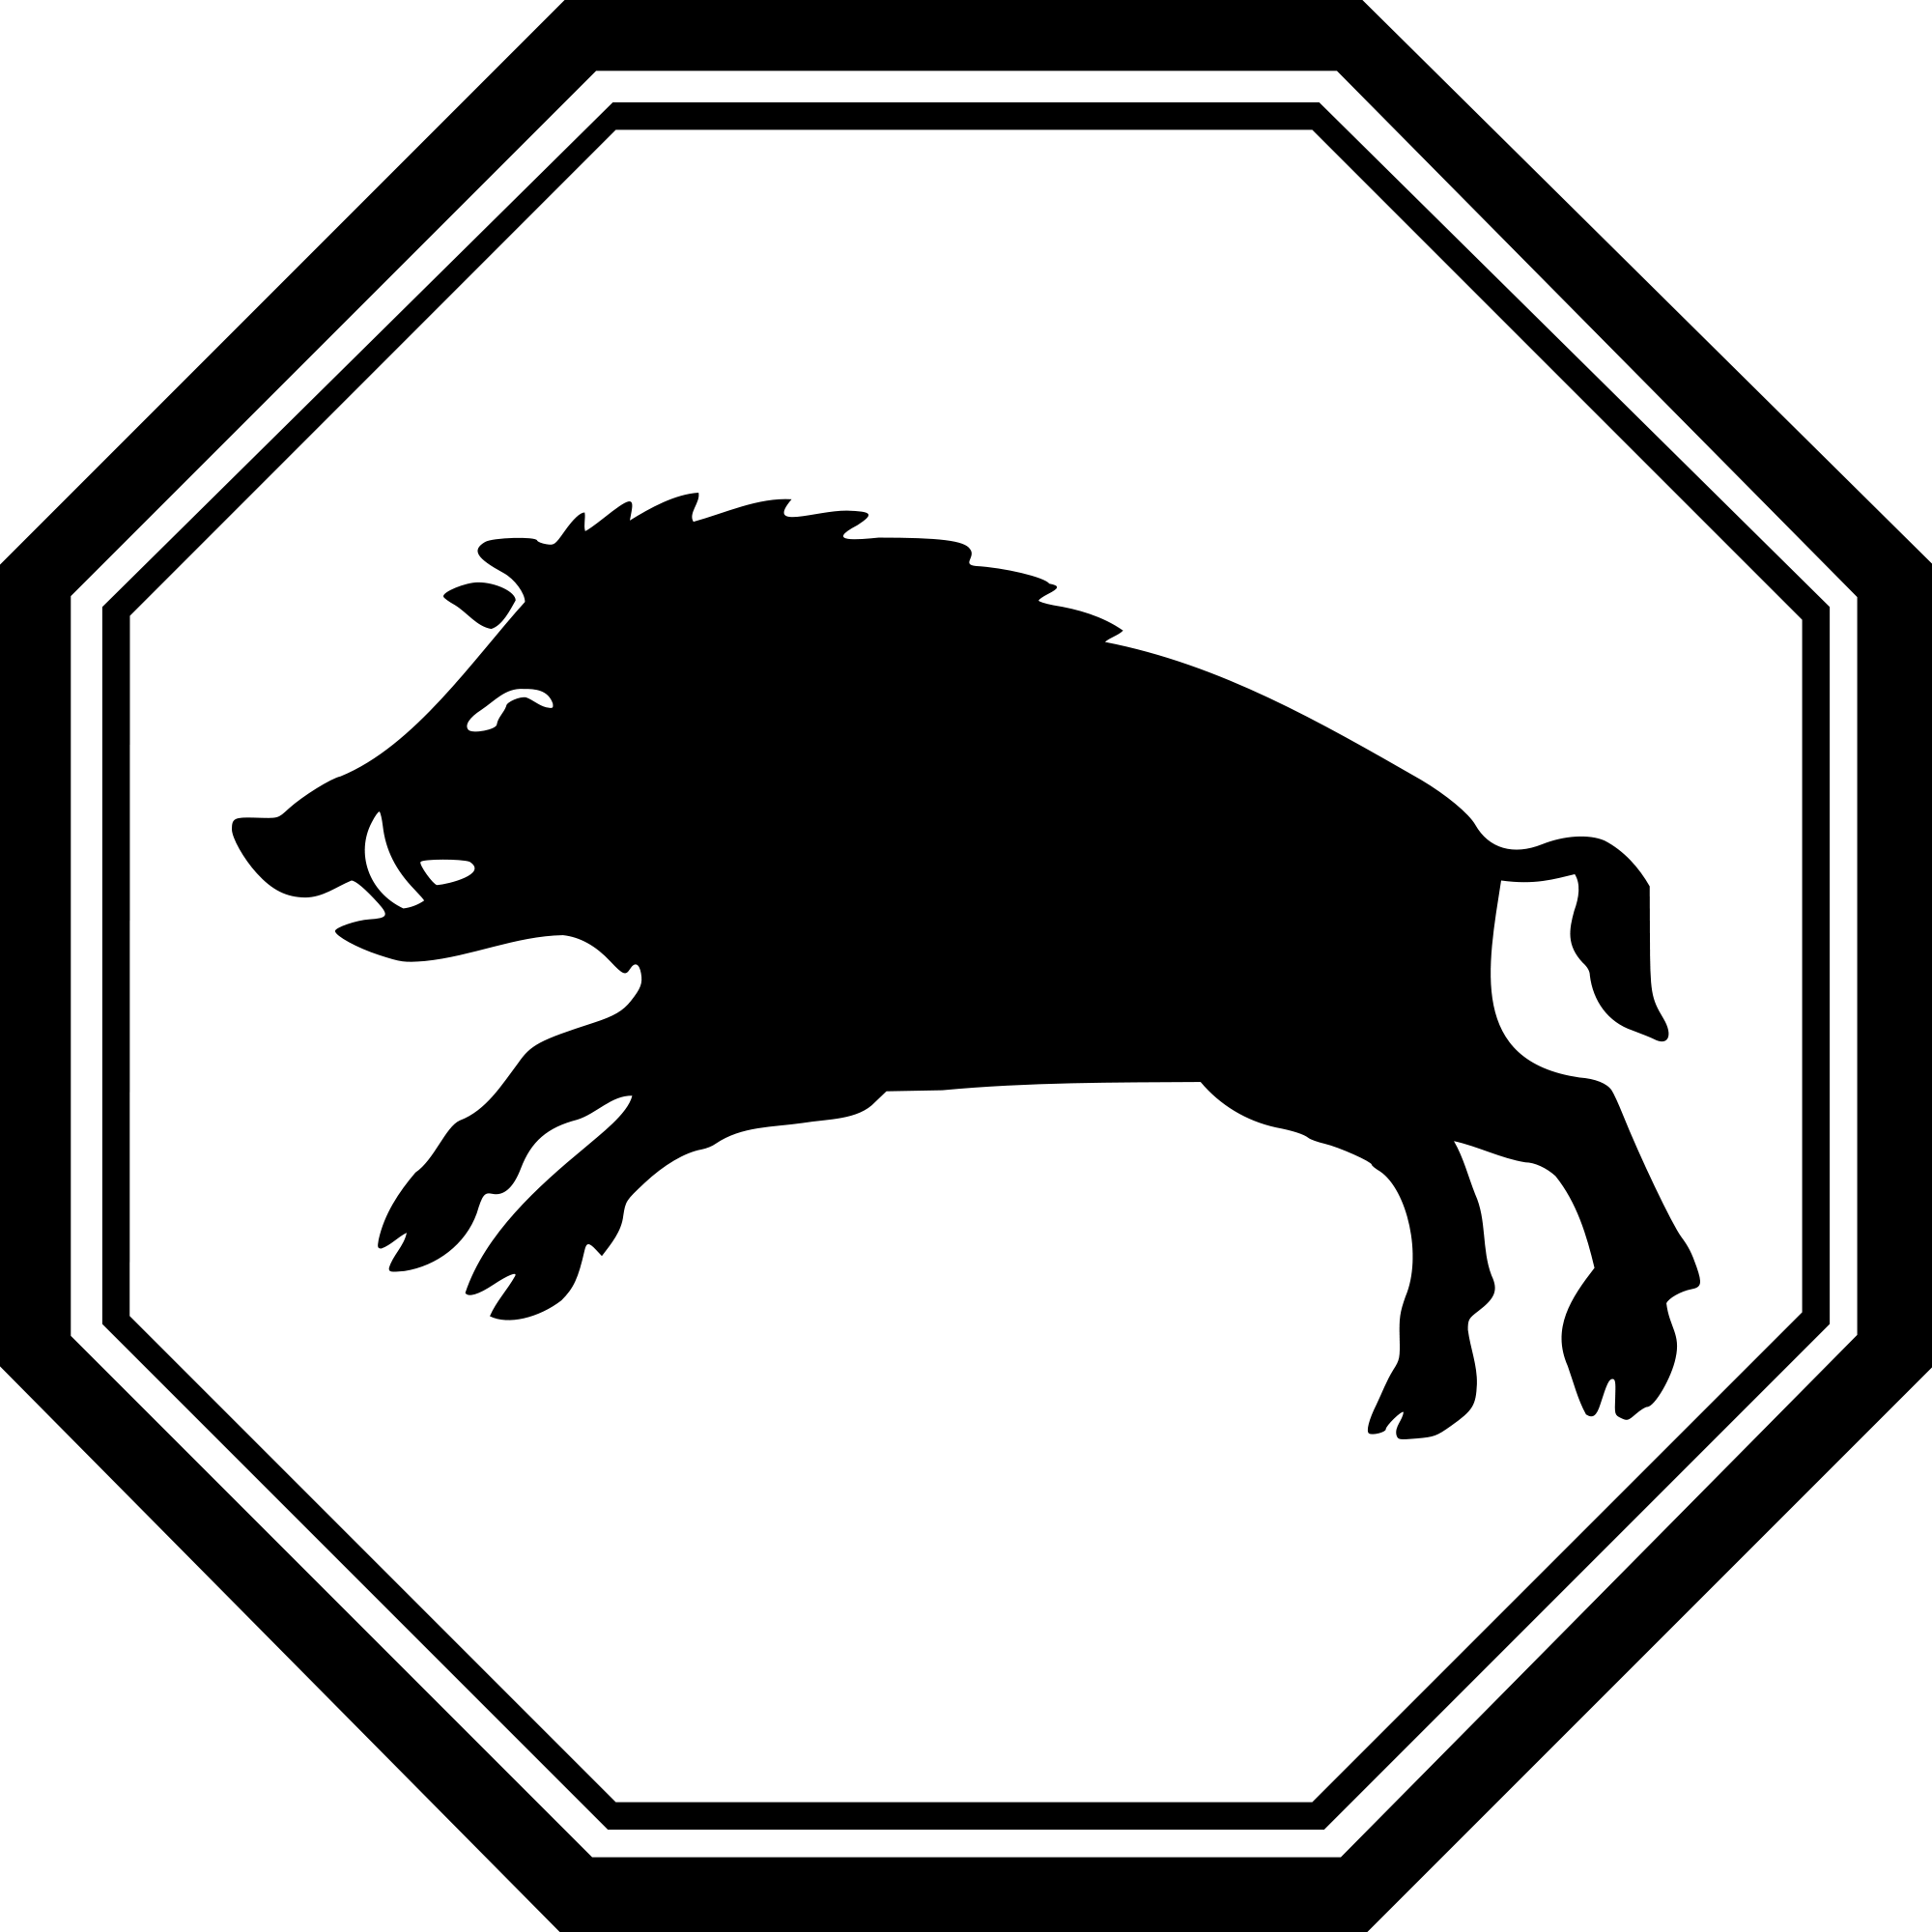 Clipart pig rectangle. File boar svg wikimedia